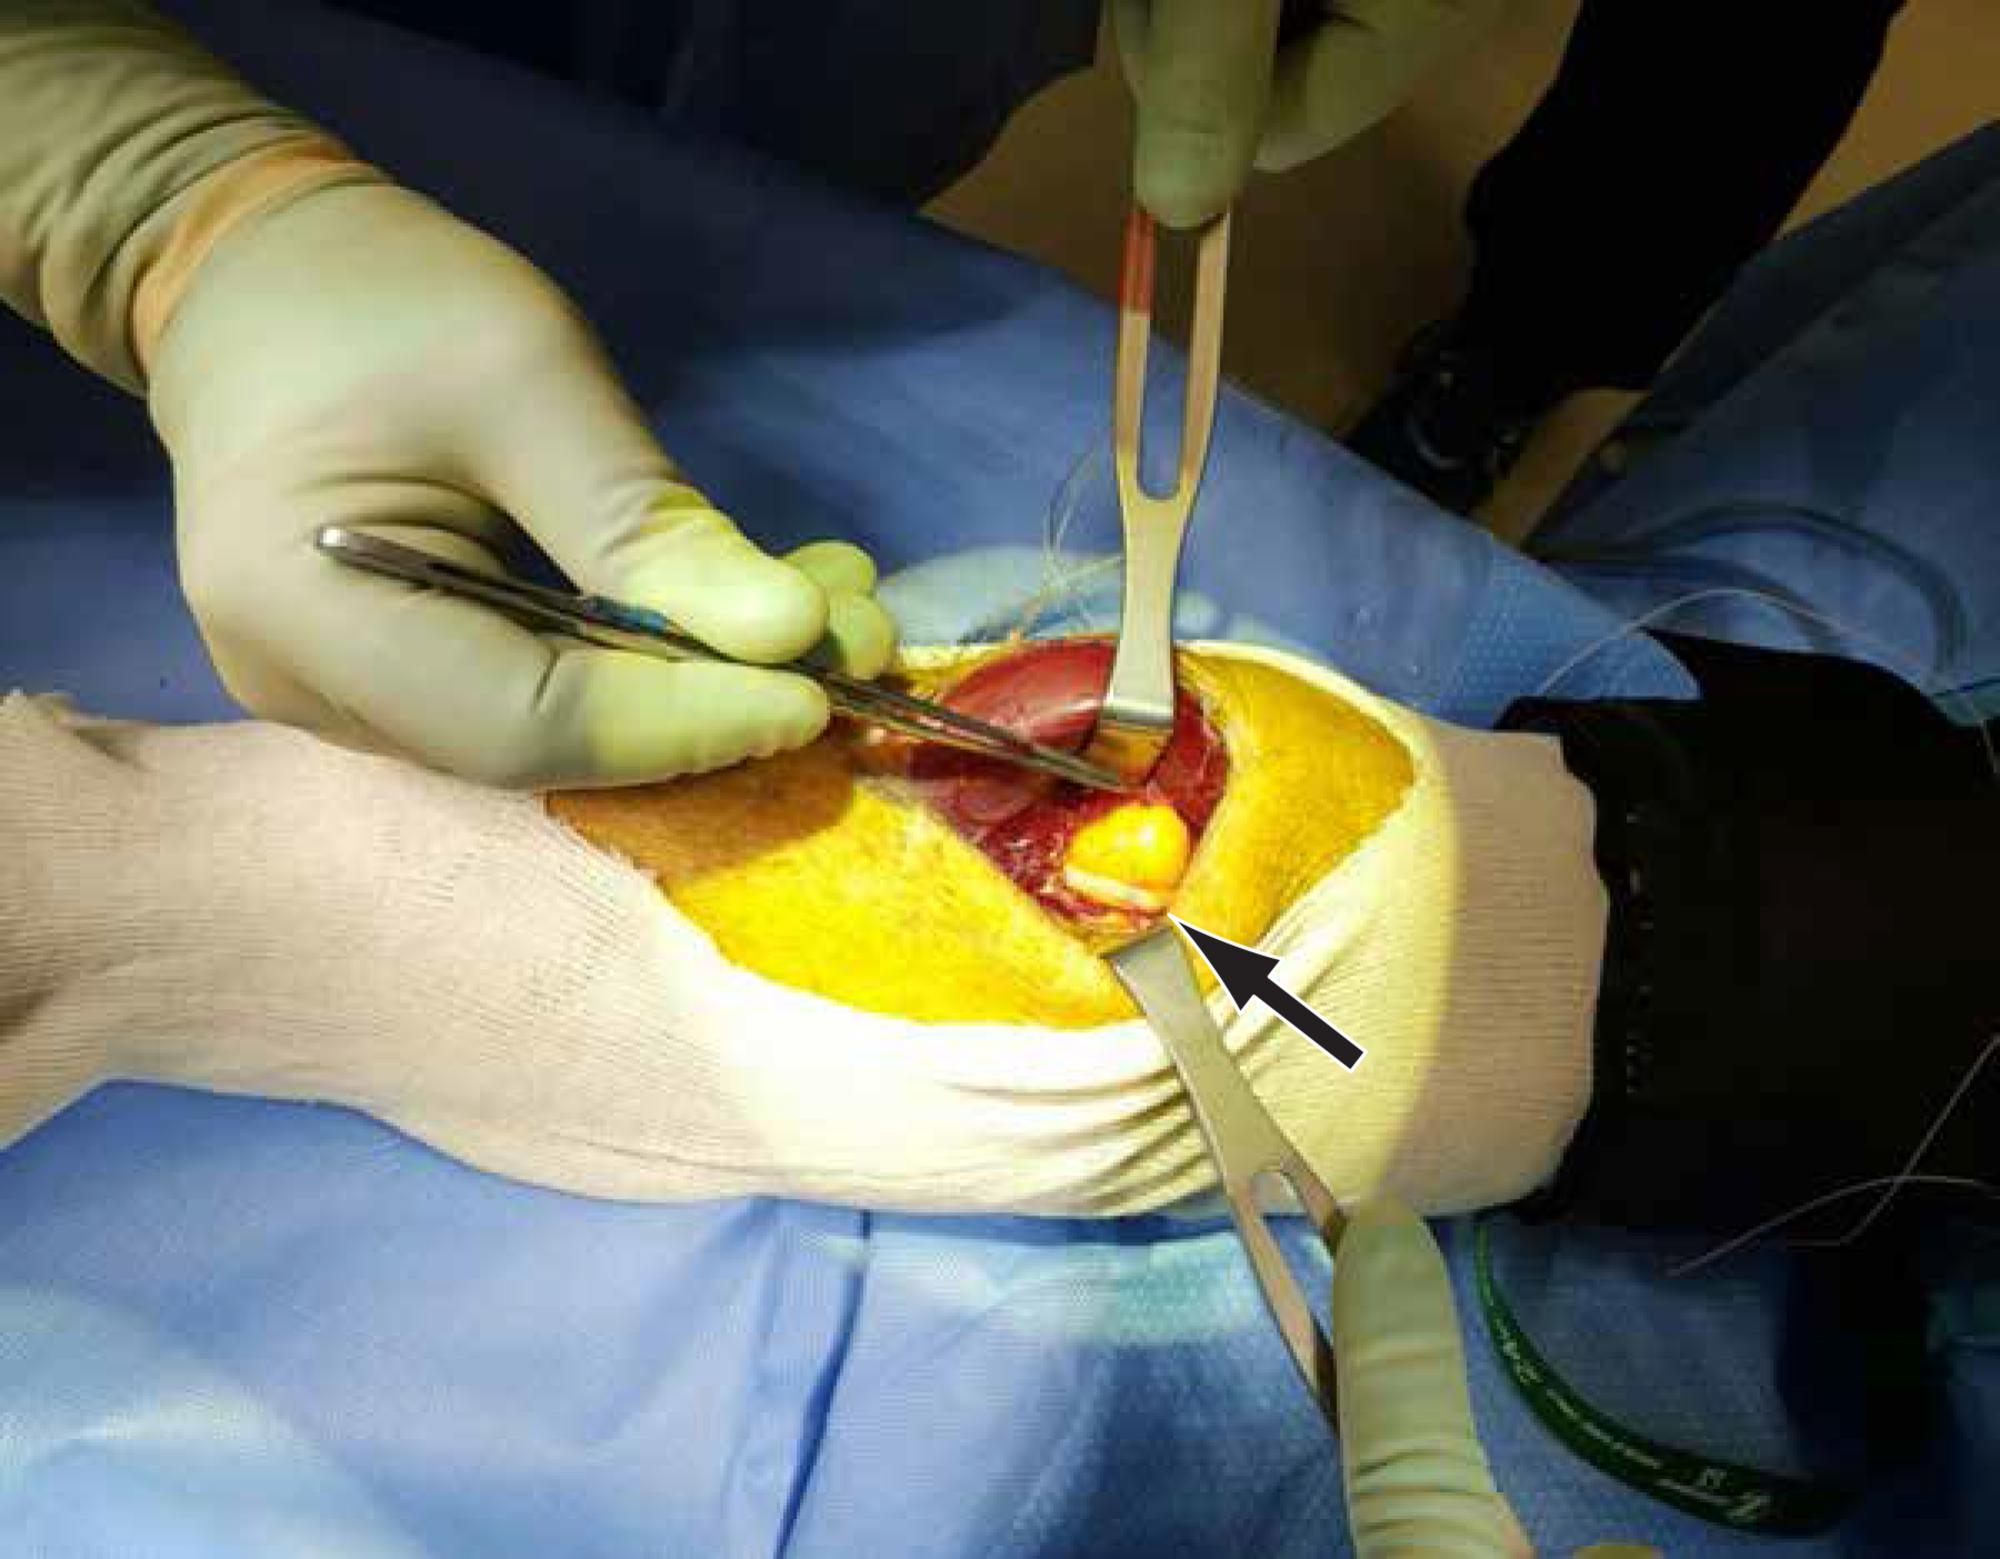 PIN-draped-across-the-lipoma